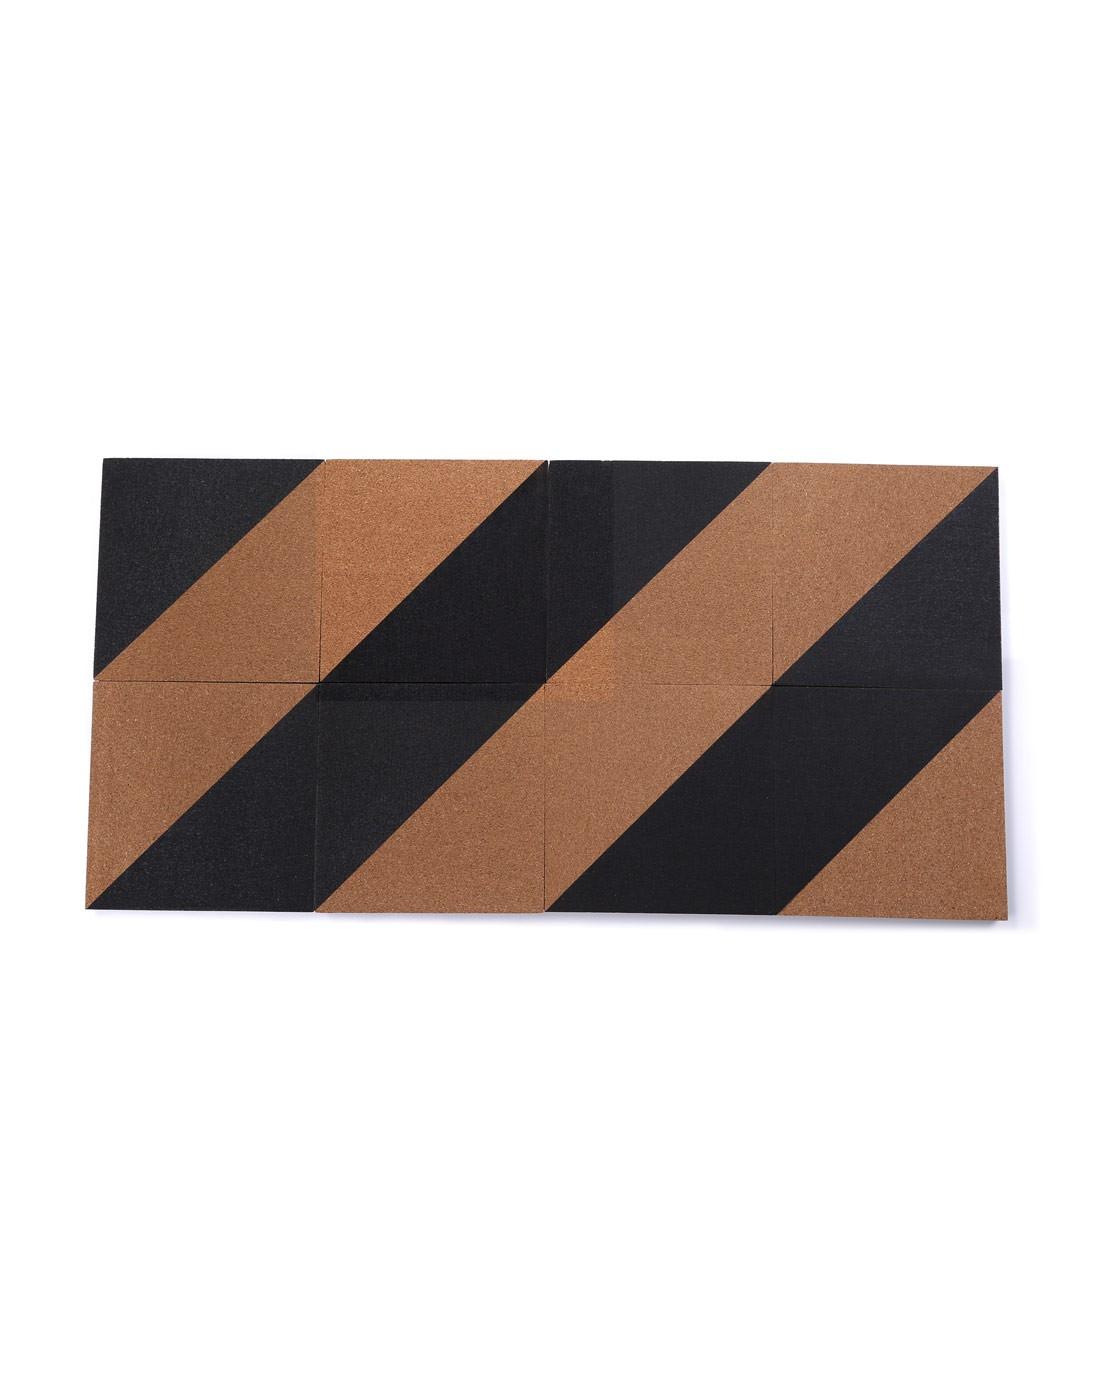 umbra创意家居用品专场图标形软木板公告牌